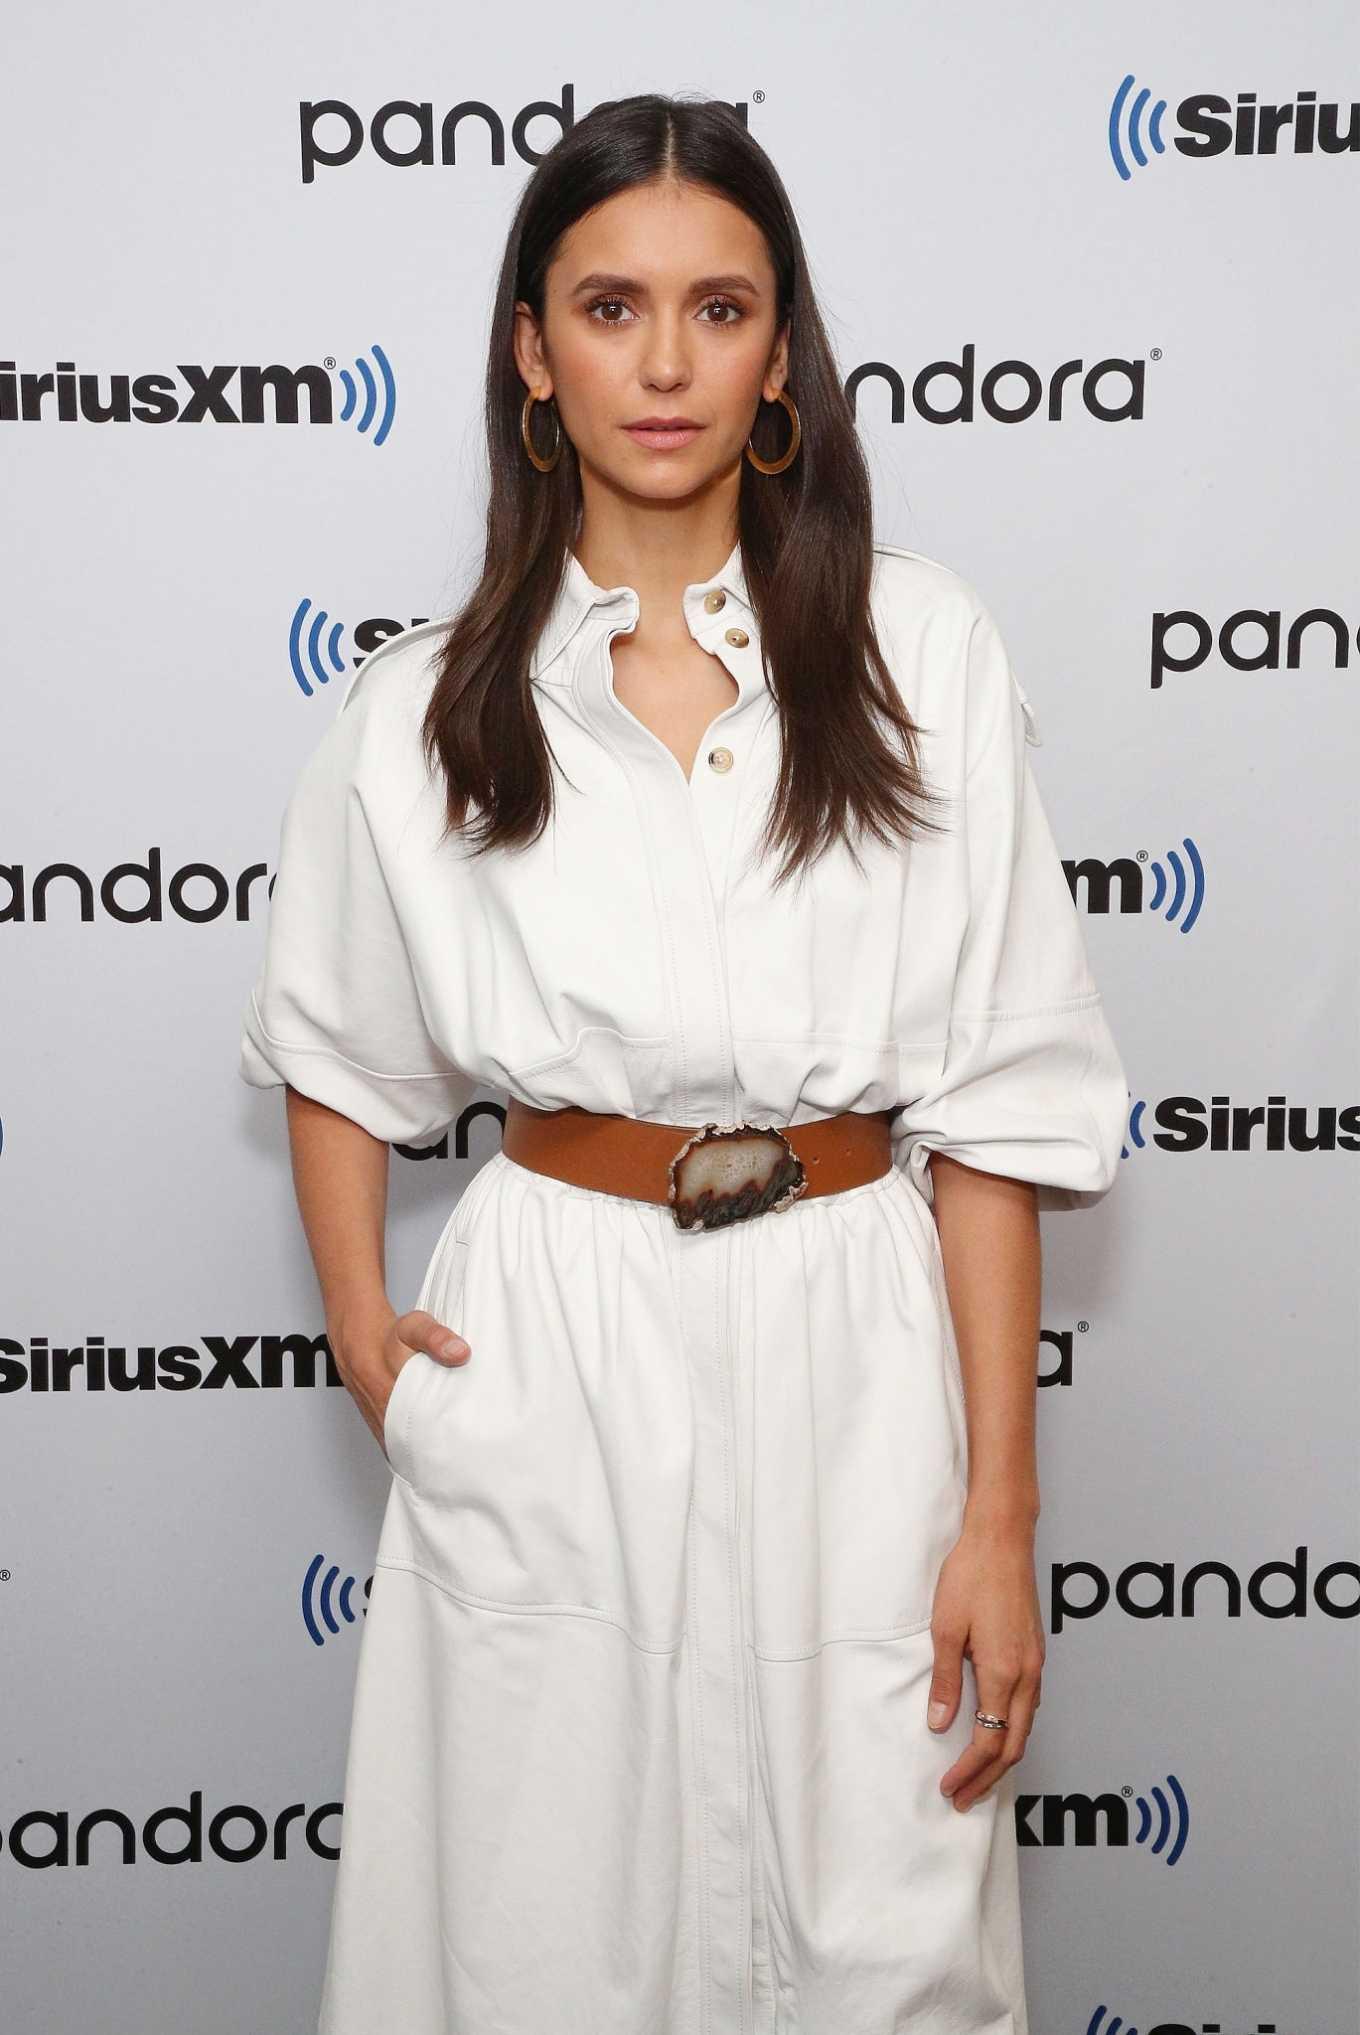 Nina Dobrev at SiriusXM Studios in NYC